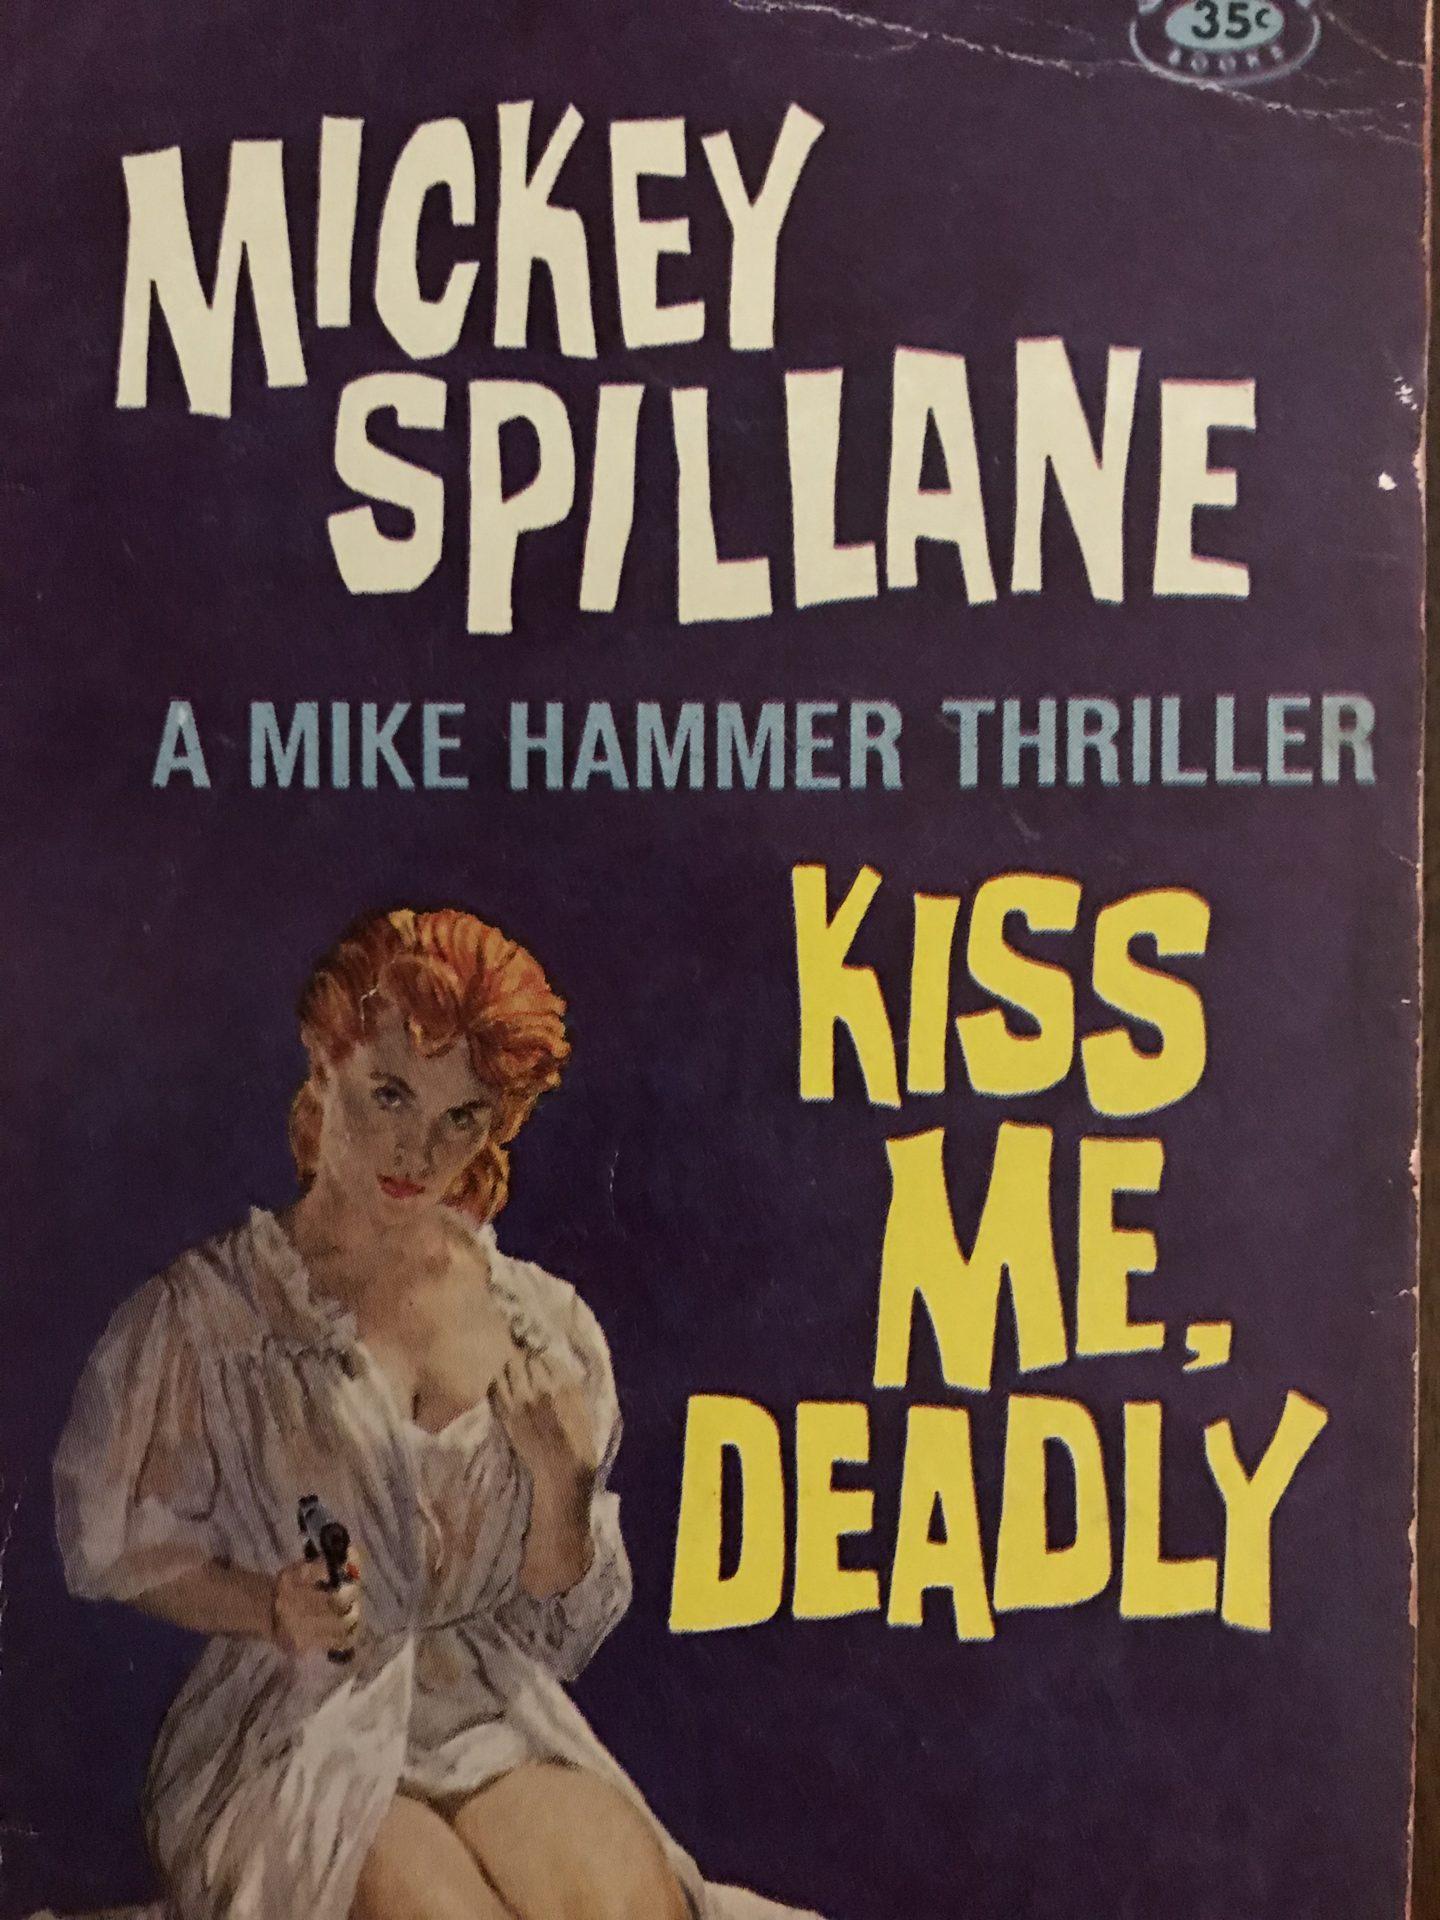 Kiss me deadly Mickey Spillane